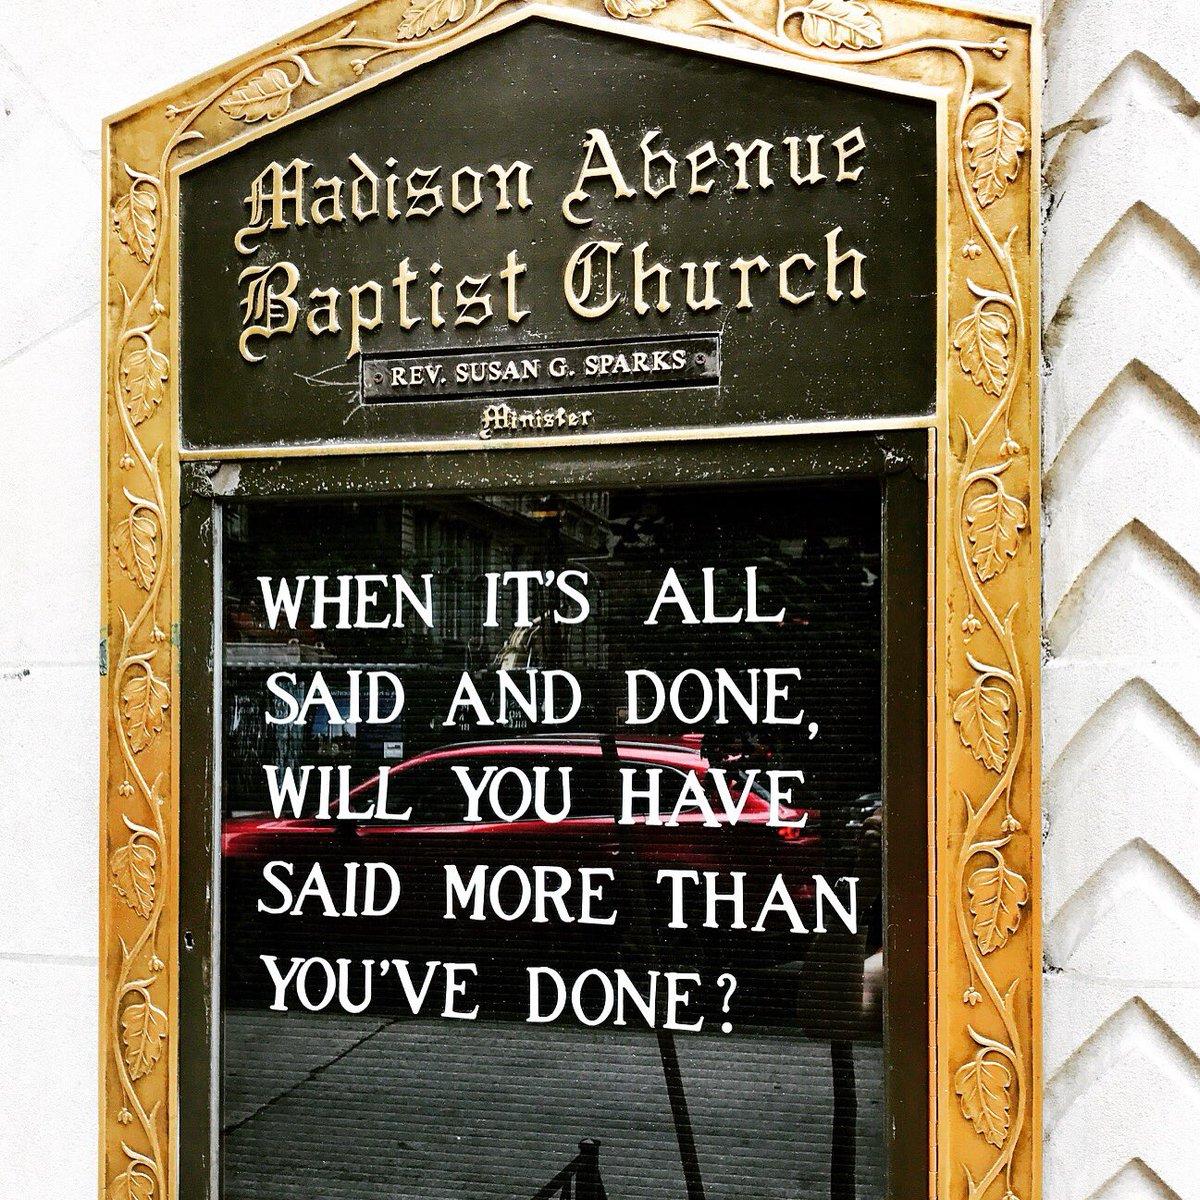 #truth #thinkaboutit #SaturdayAfternoonGroove #lifelessons #doitnow ht...